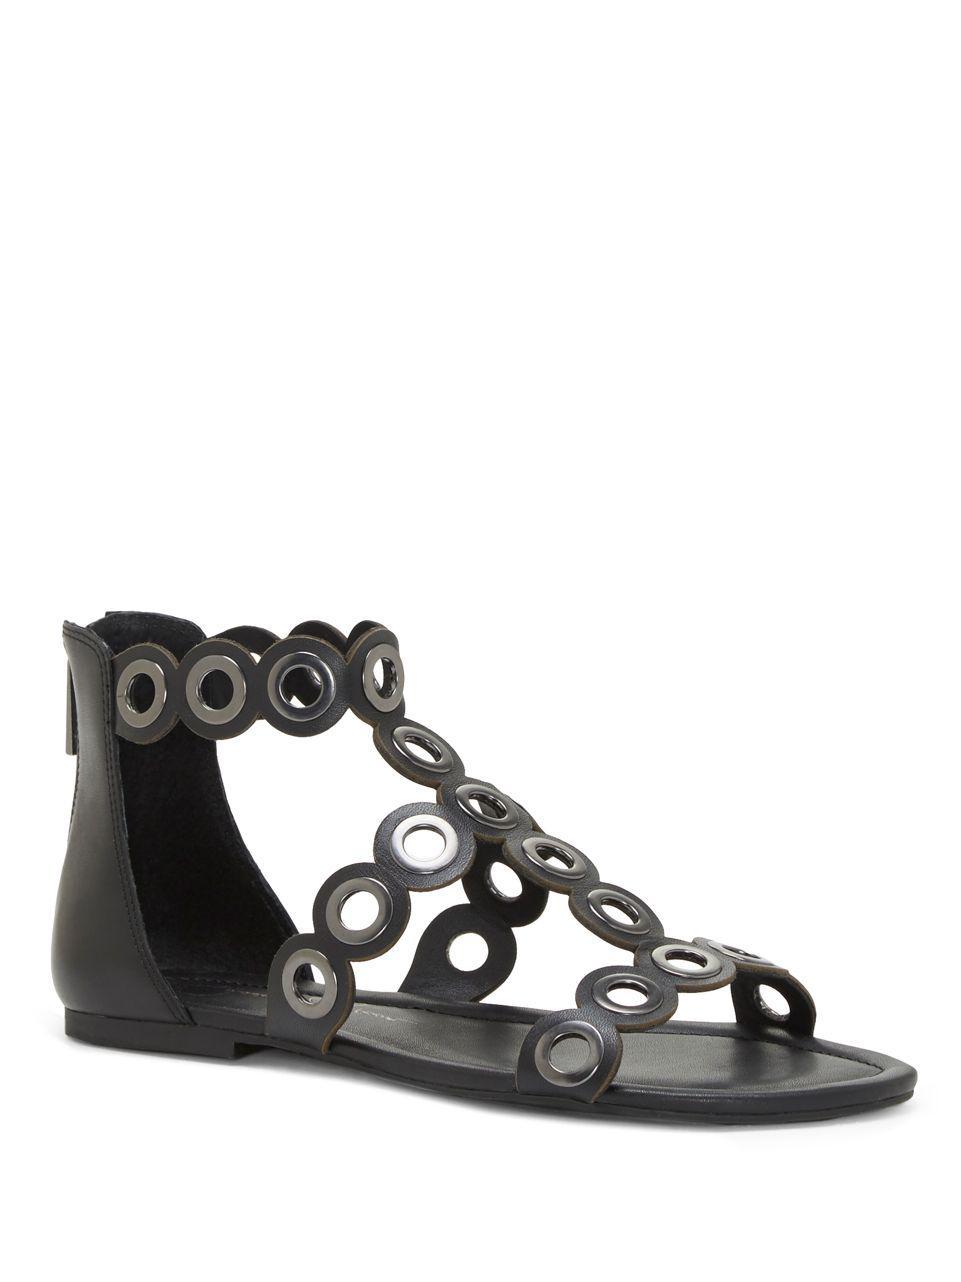 2bce1d55c50 Lyst - Jessica Simpson Korva Leather Sandals in Black